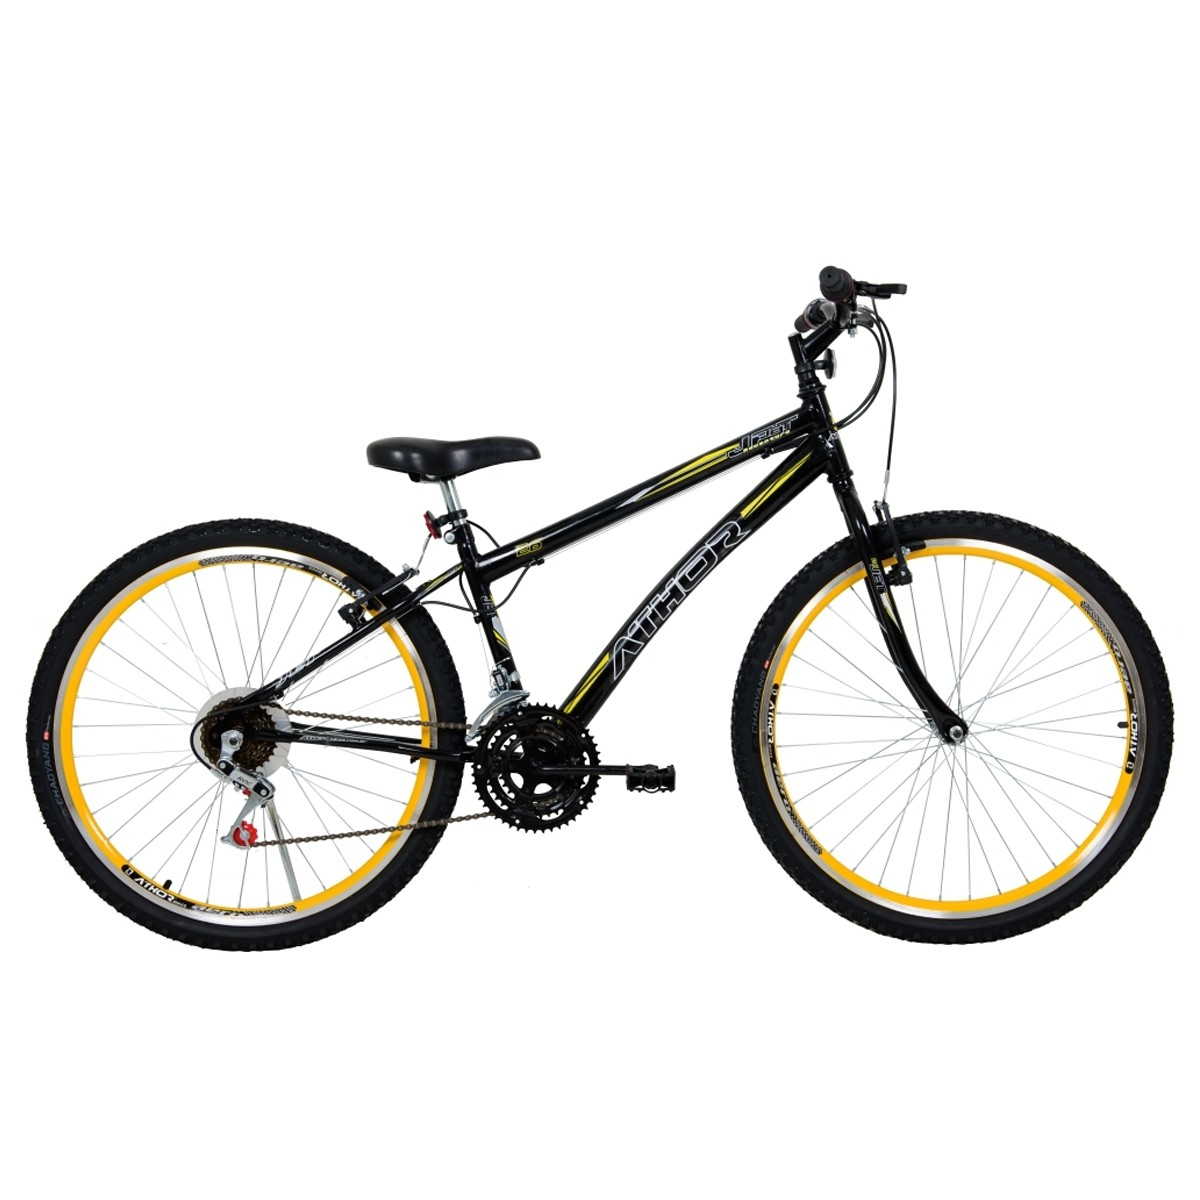 Bicicleta Athor Jet Rebaixada Passeio Aro 26 18v Masculino